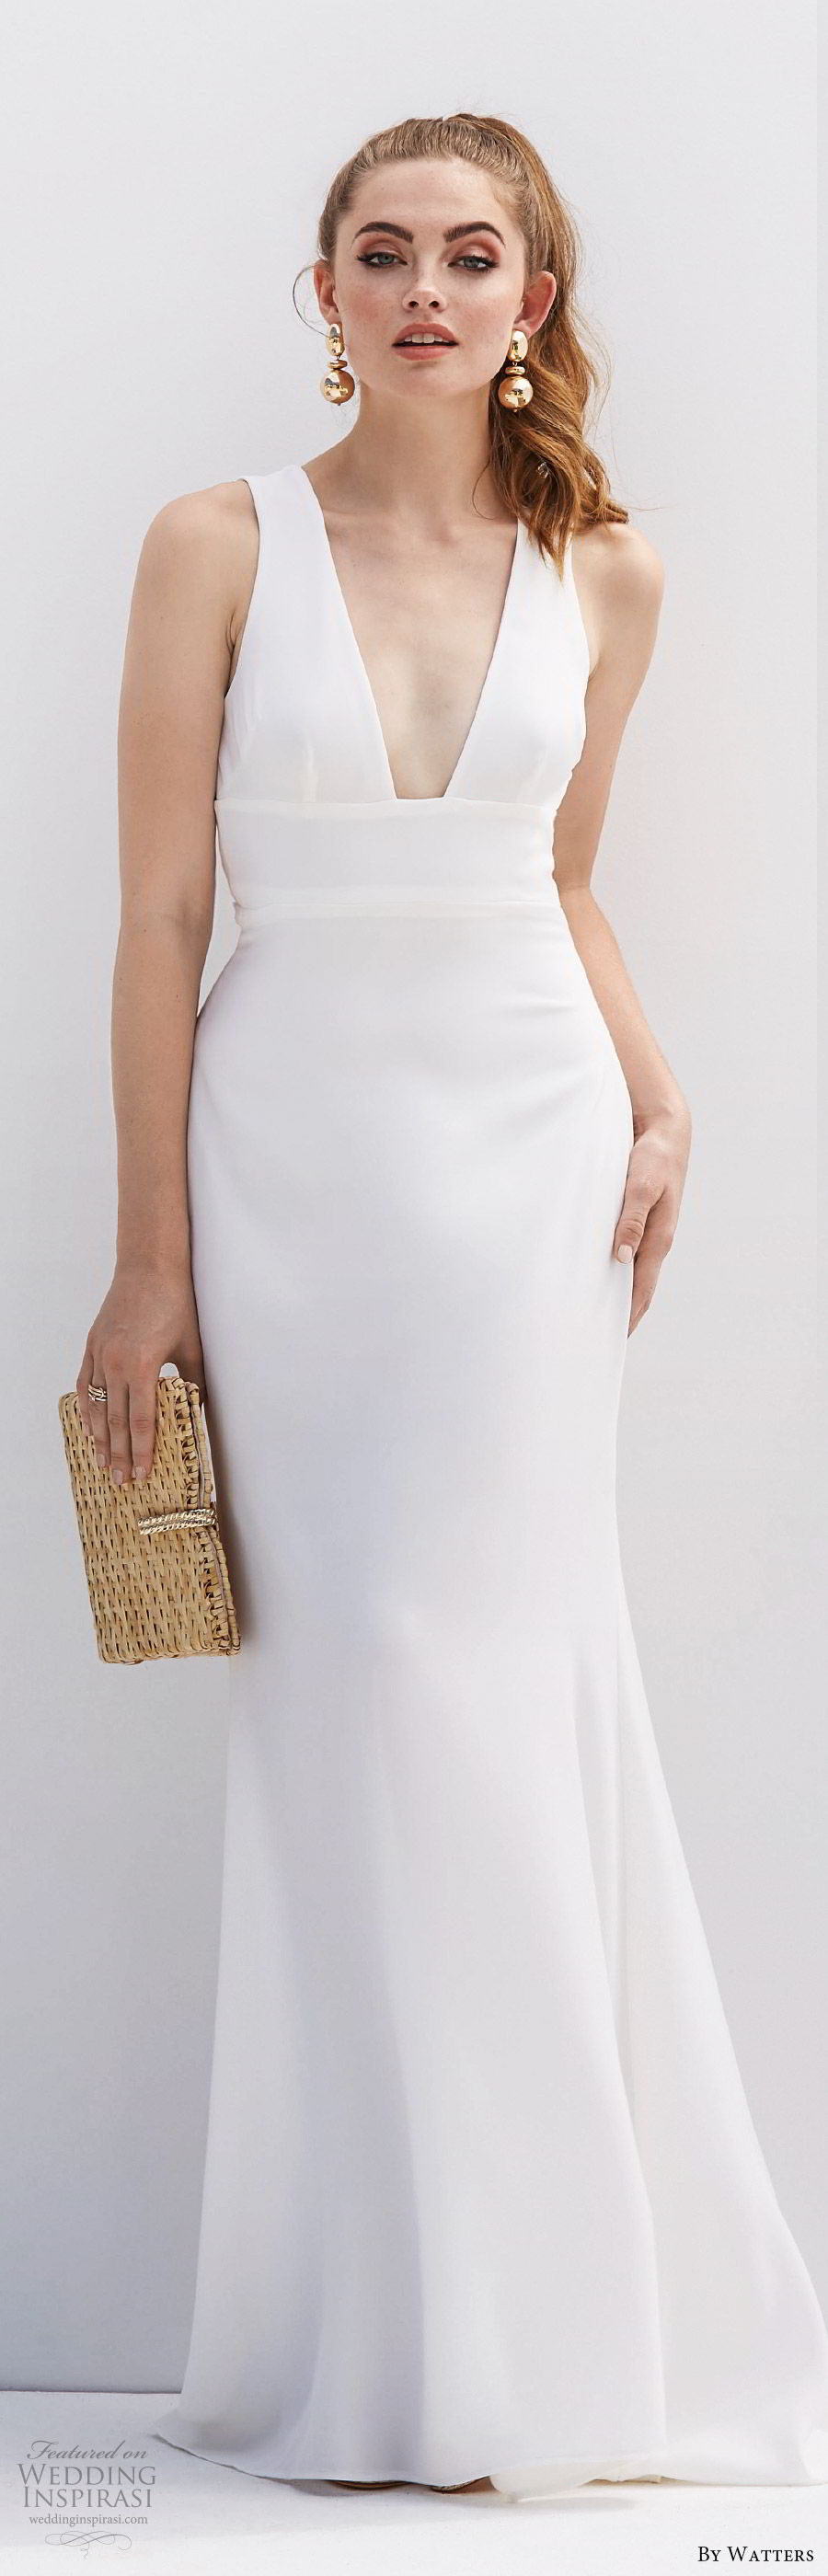 by watters 2020 bridal sleeveless deep v neckline minimally embellished sheath trumpet wedding dress (3) cutout back sweep train clean chic elegant mv